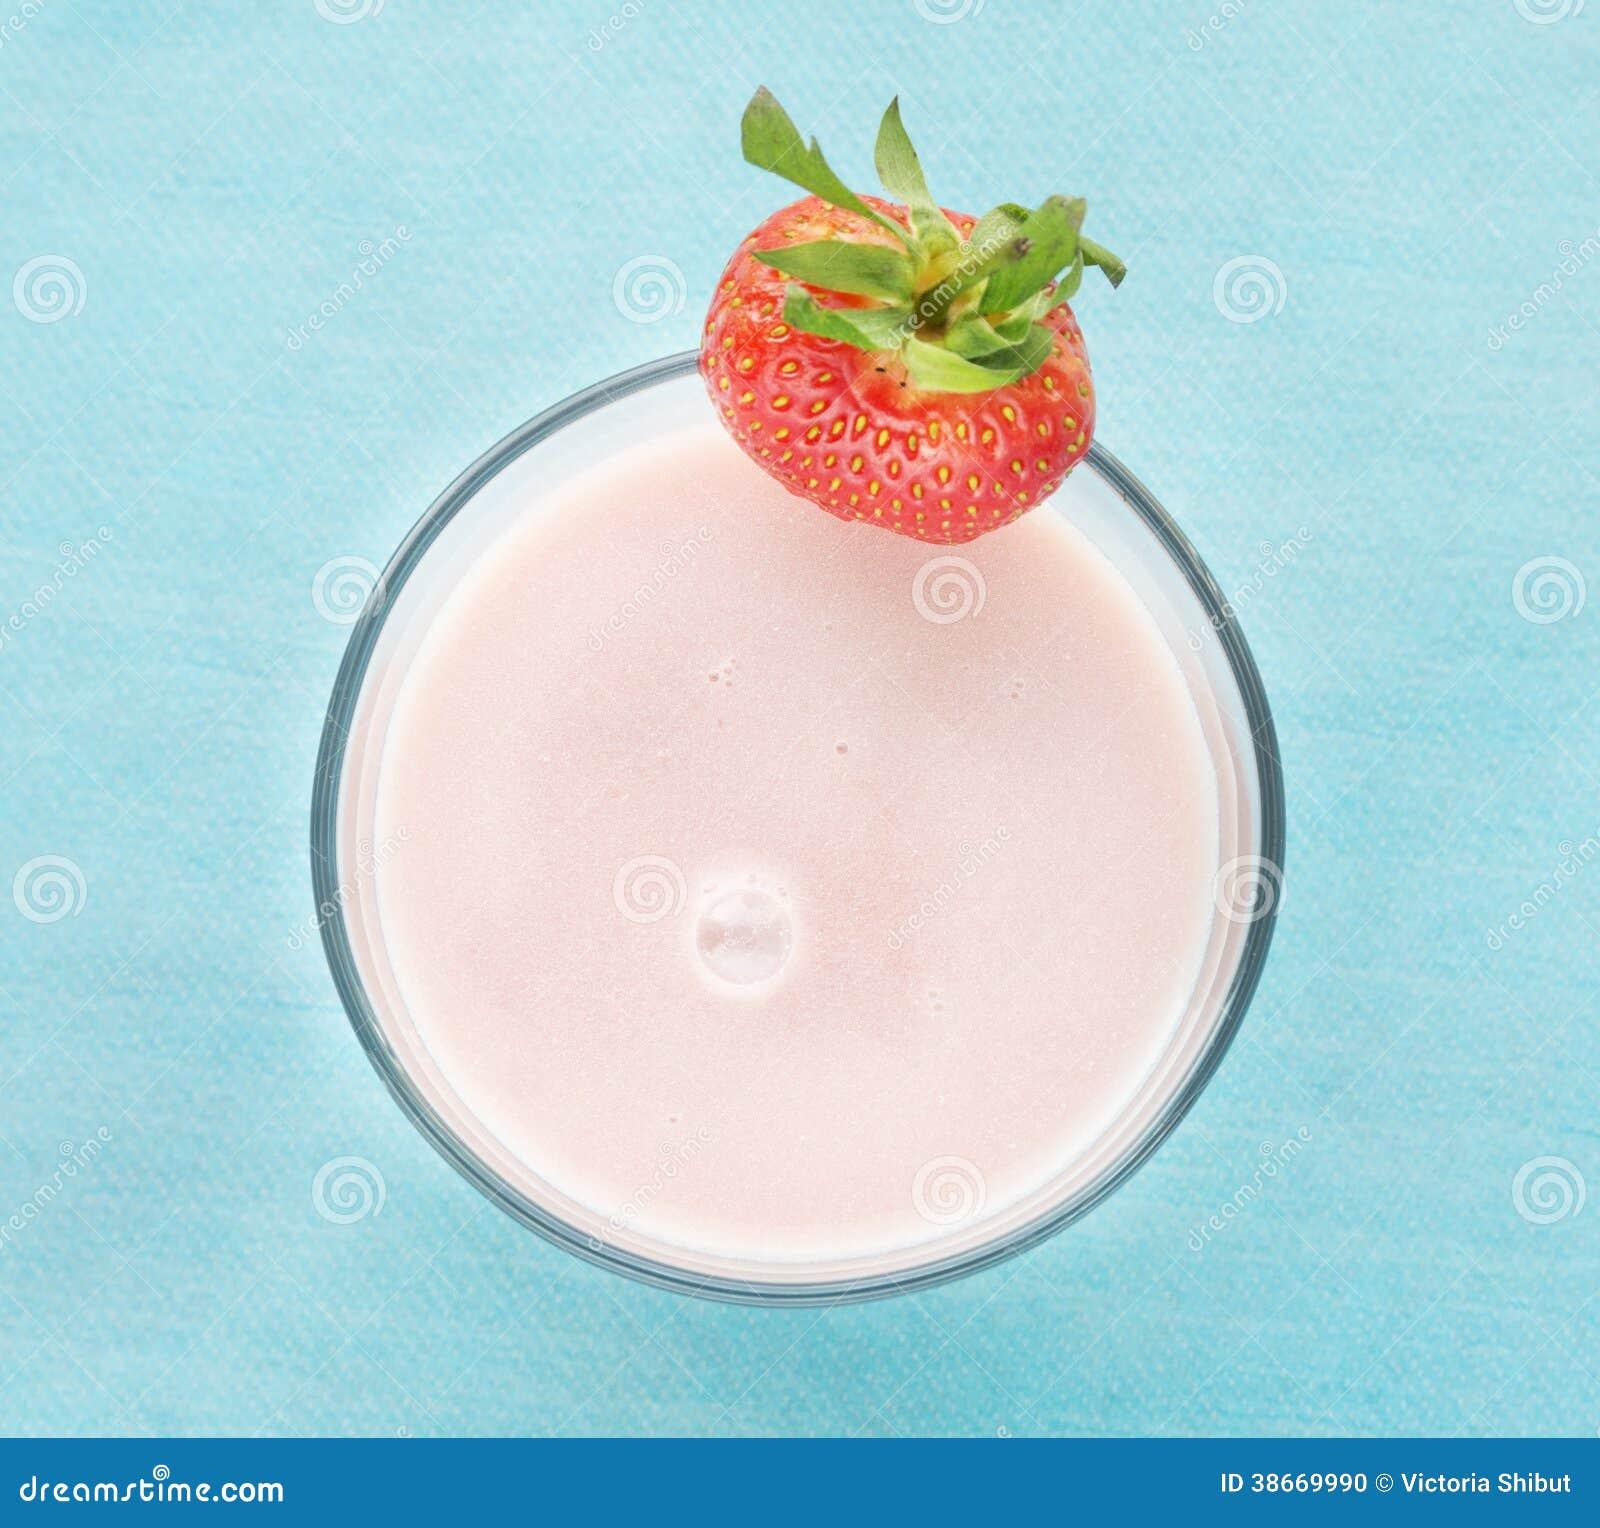 Strawberry Mascarpone Scones With Honey Milk Glaze Momofuku Milk Bar S